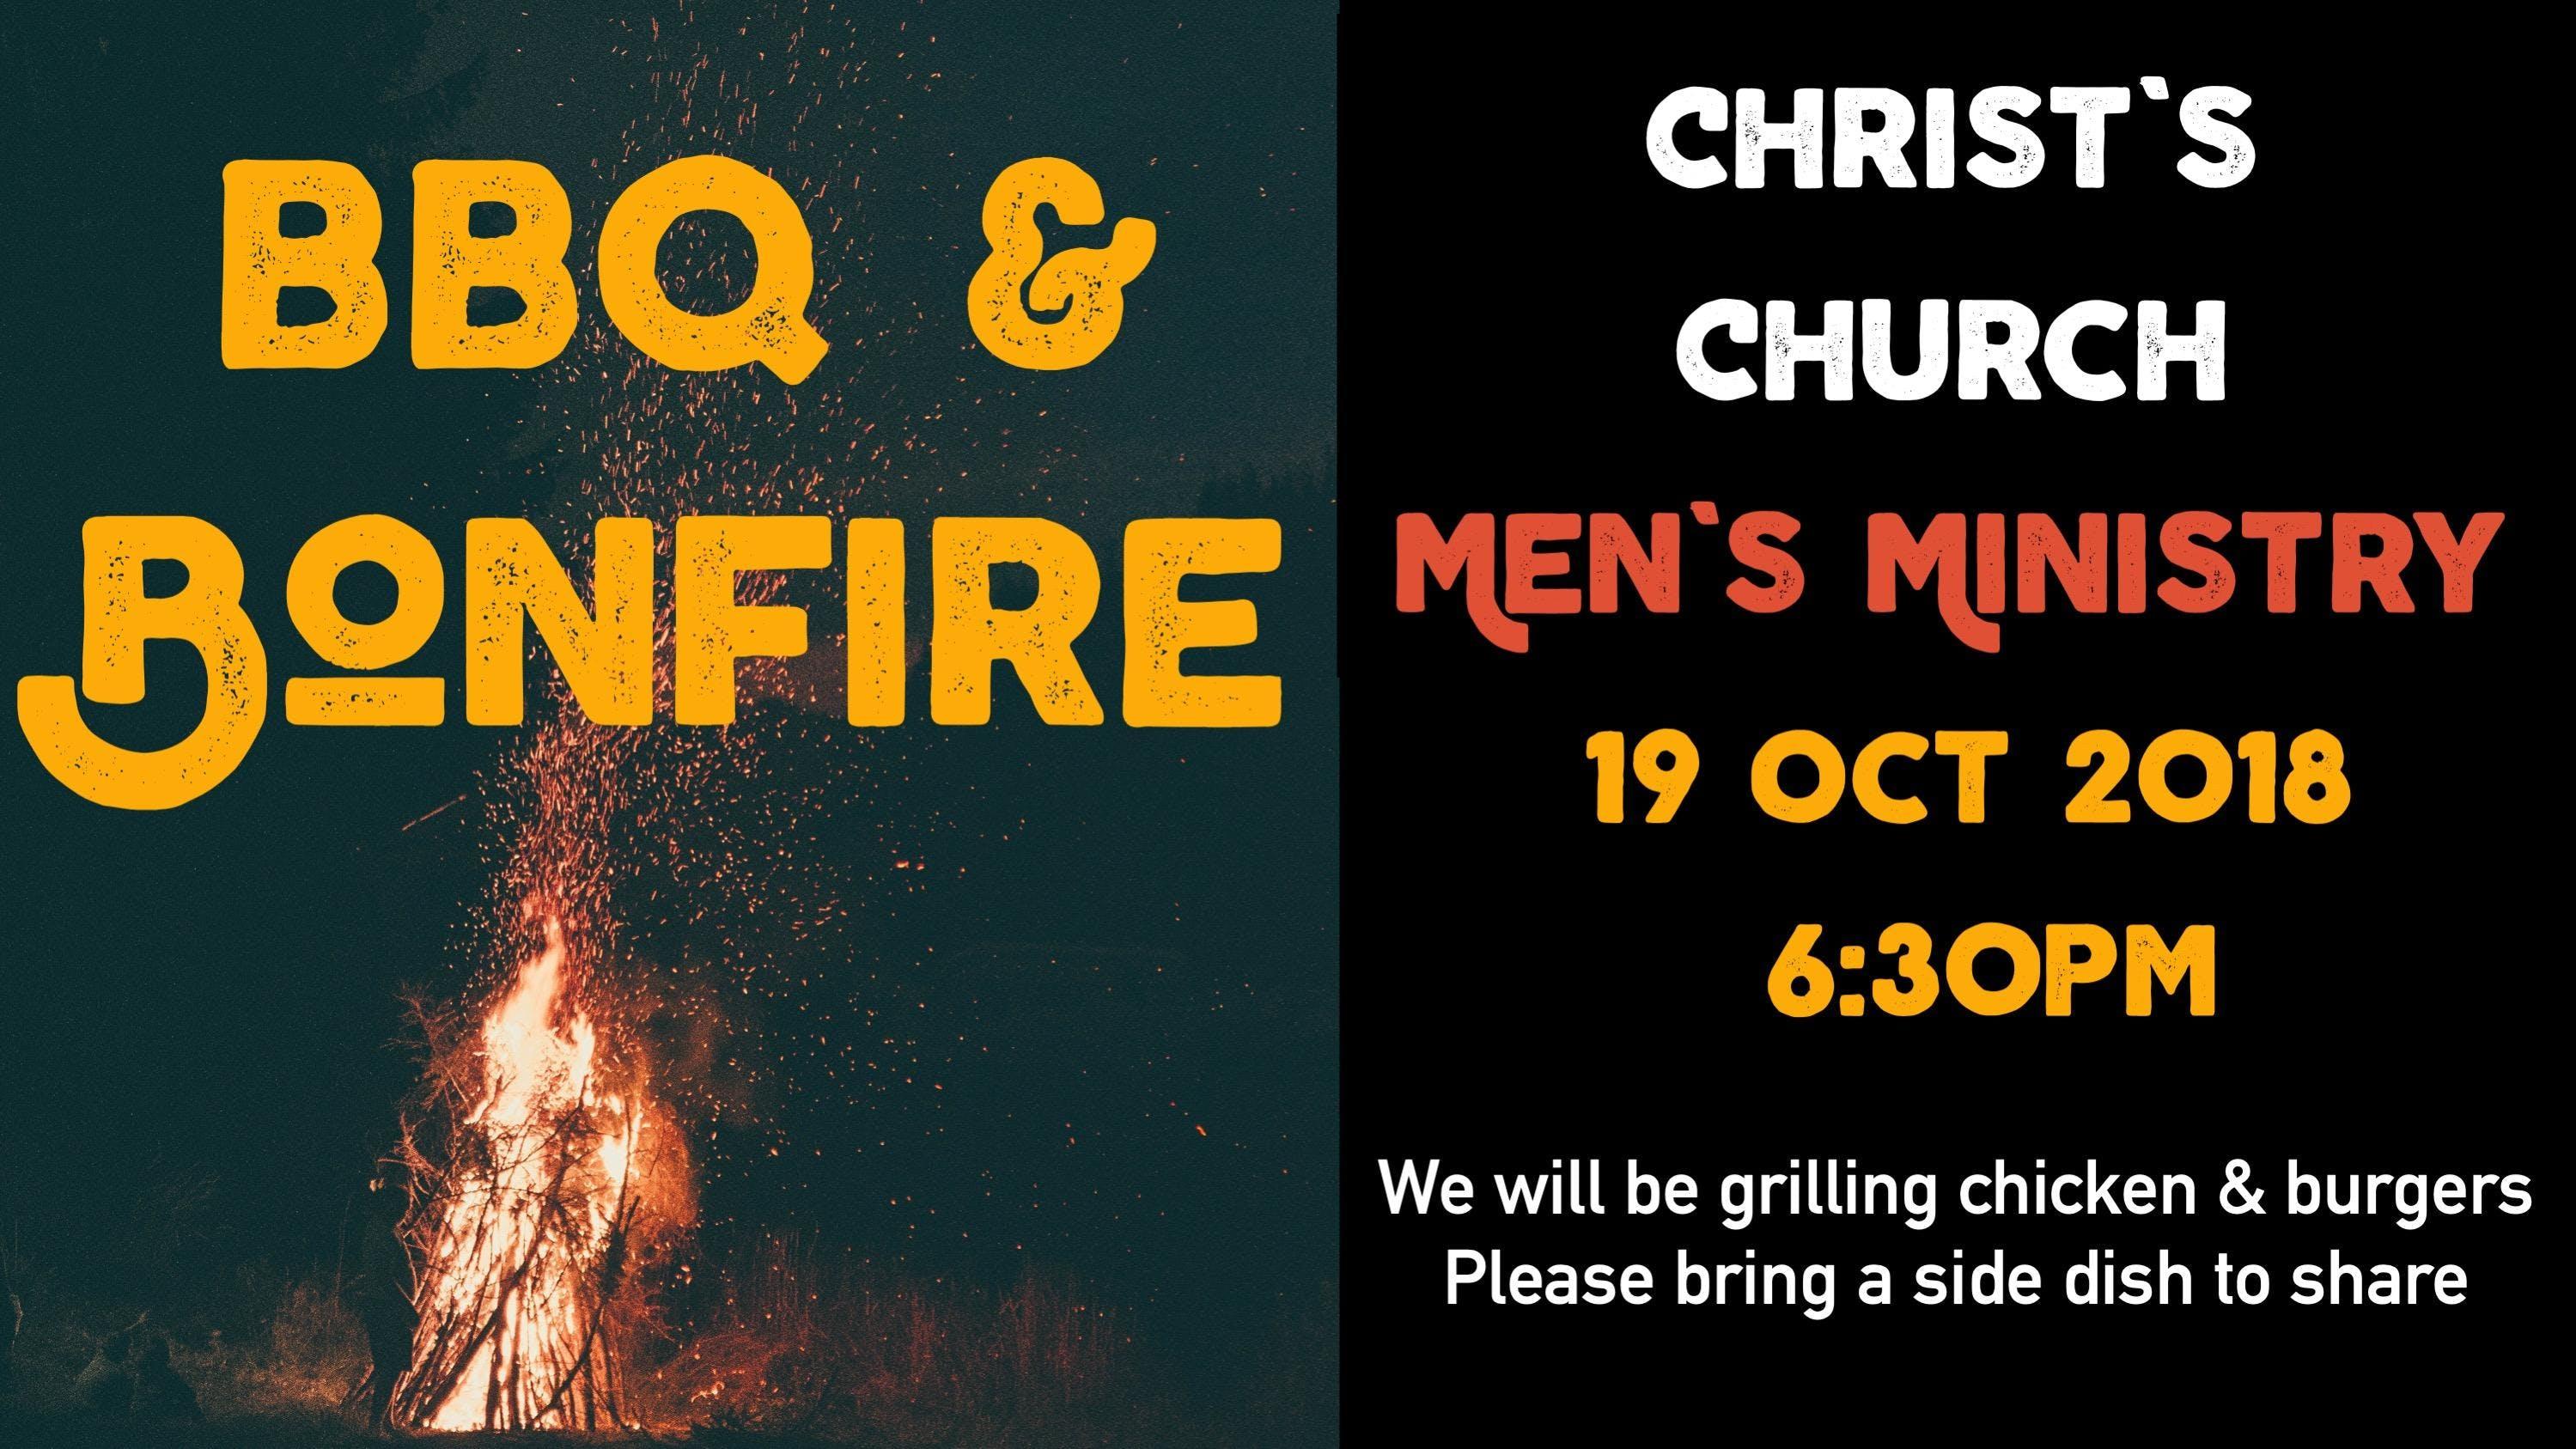 Bonfire & BBQ: Christ's Church Men's Ministry